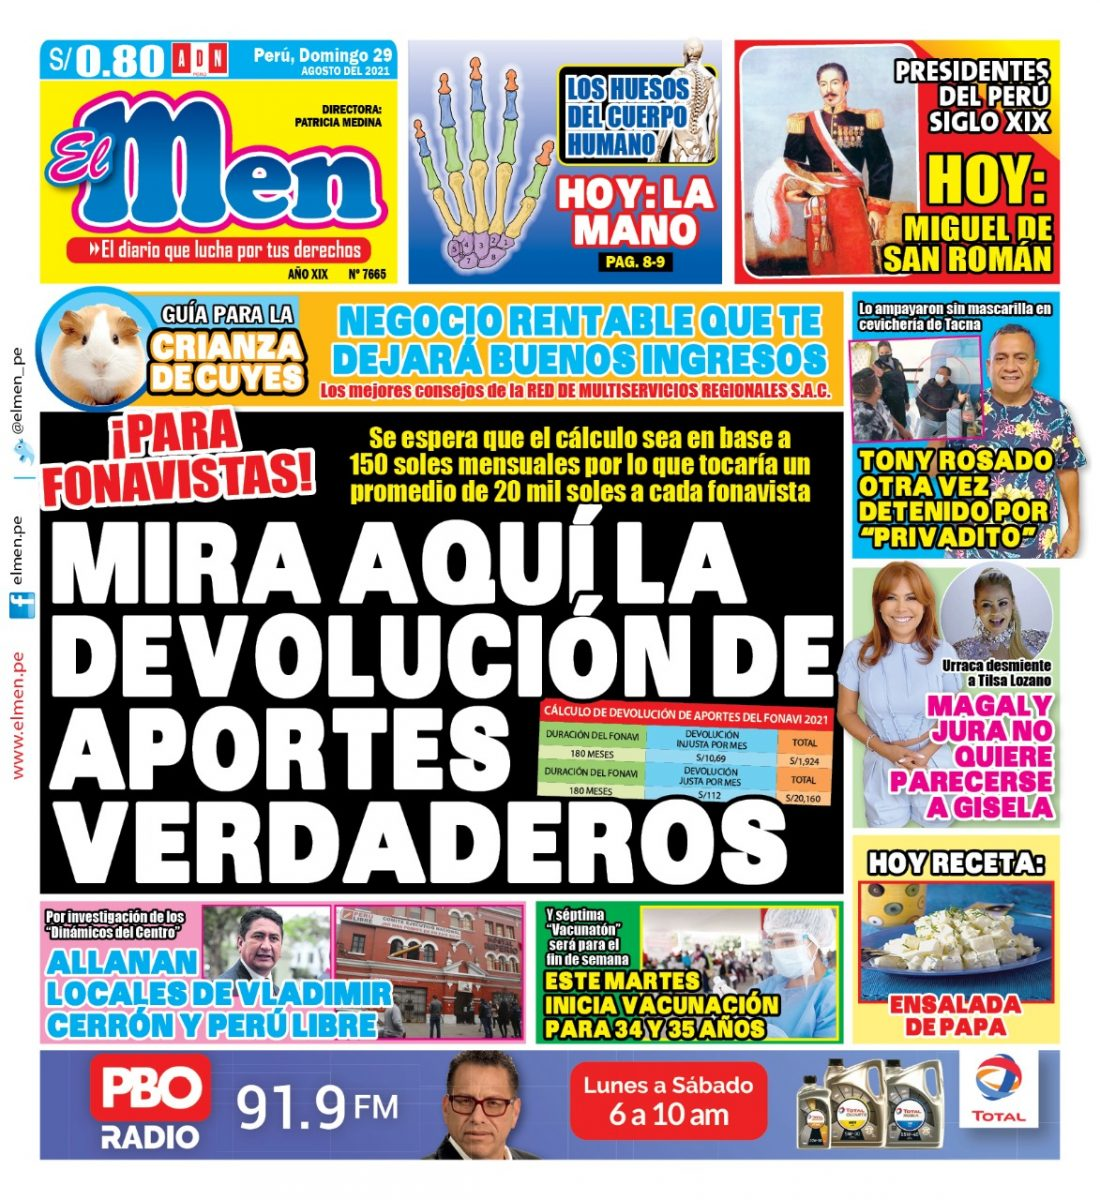 Portada impresa – Diario El Men (29/08/2021)